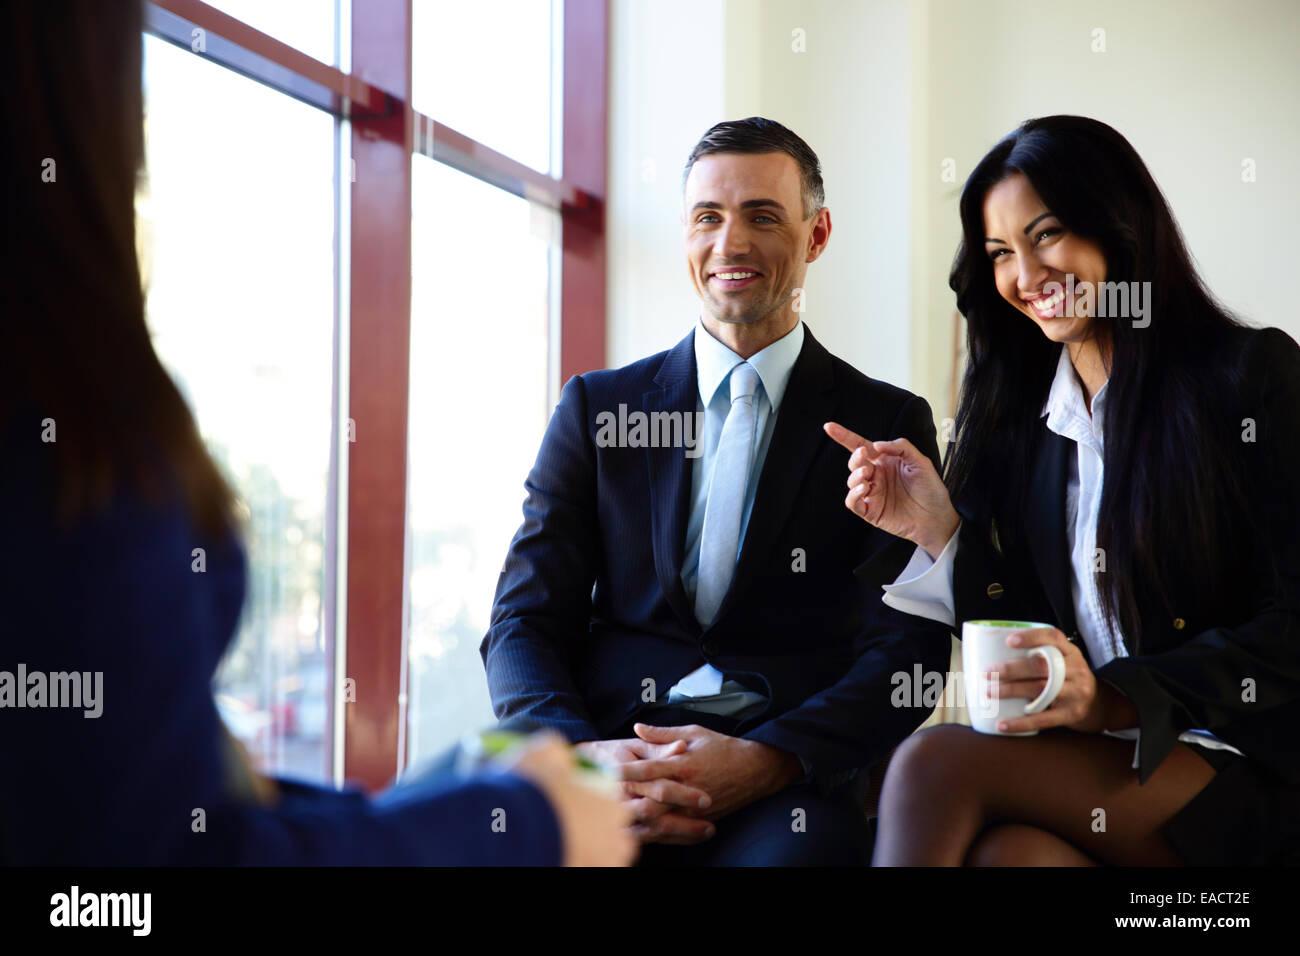 Smiling businesspeople having coffee break in office - Stock Image